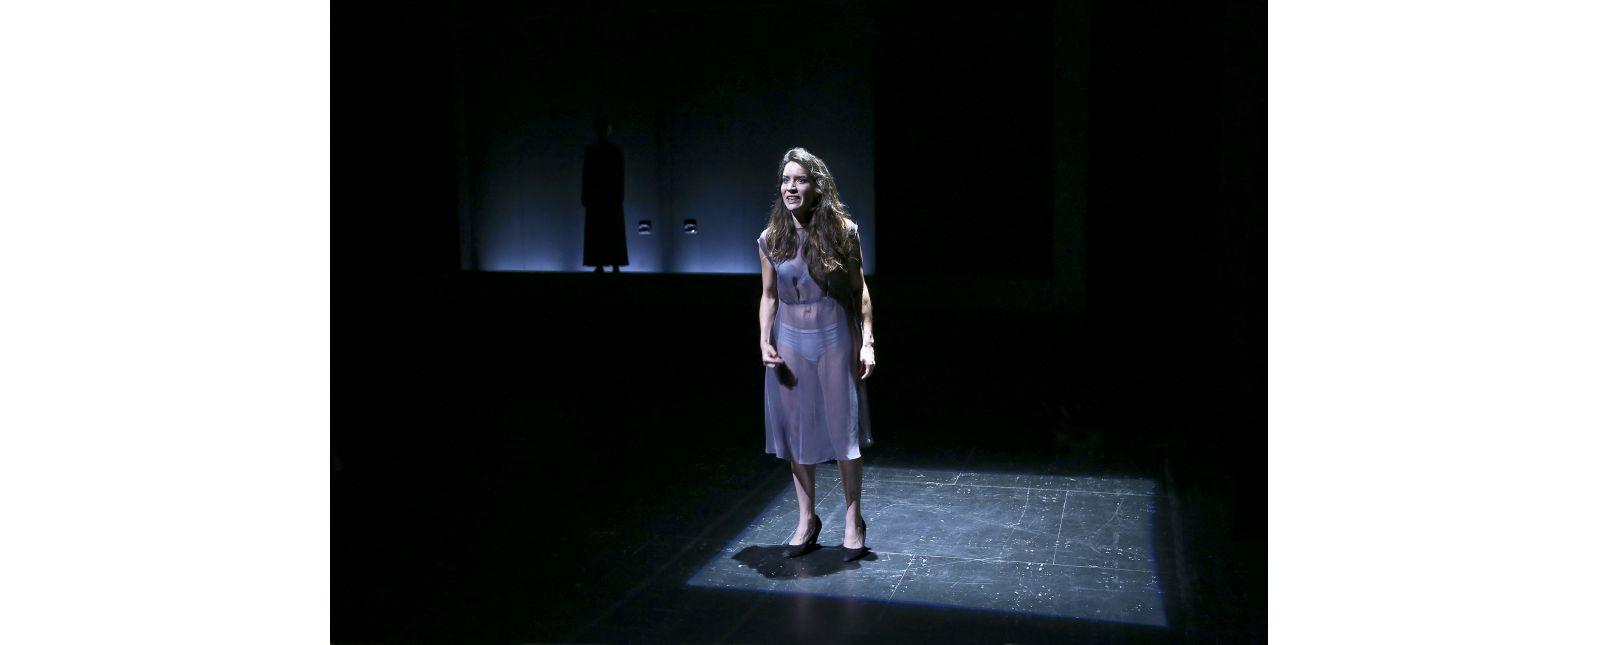 MayDay // Anne Langer, Laura Angelina Palacios // Birgit Hupfeld // 2018